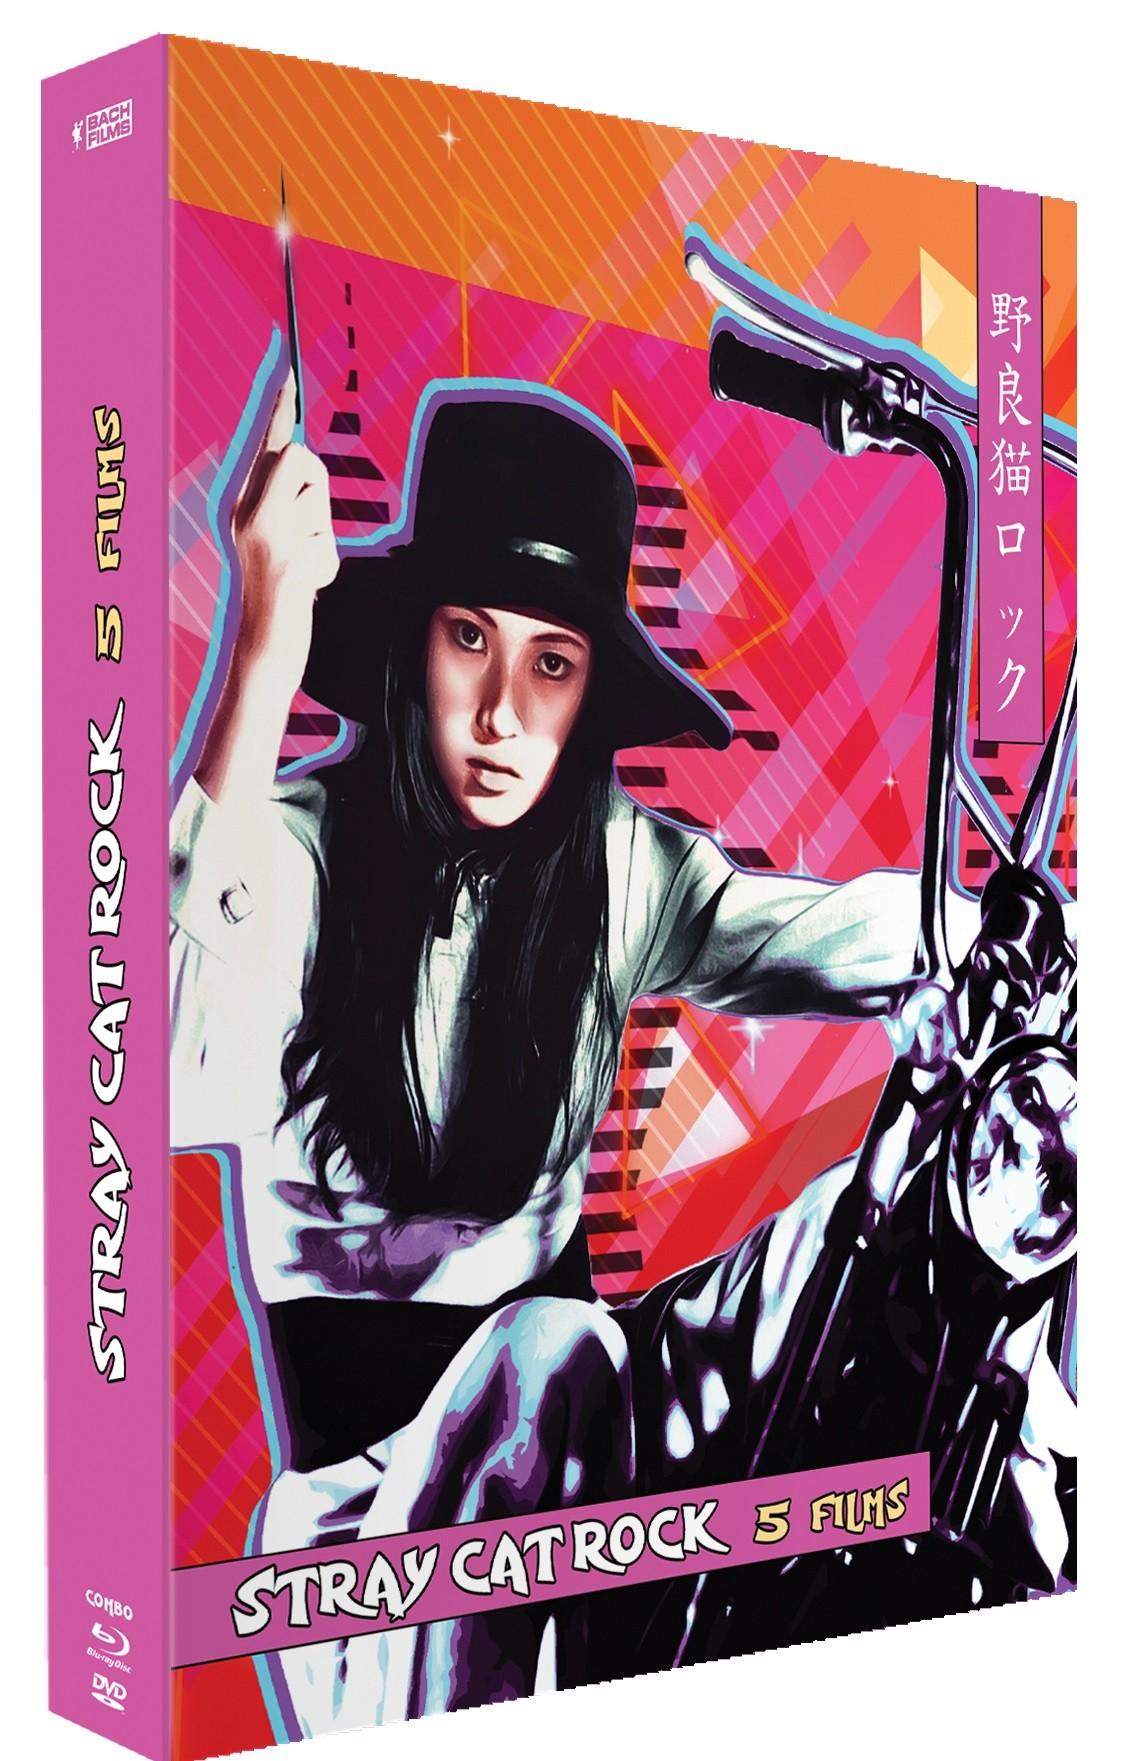 STRAY CAT ROCK COFFRET - SEX HUNTER - FFEMALE BOSS - MACHNE ANIMAL - WILD JUMBO - BEAT '71